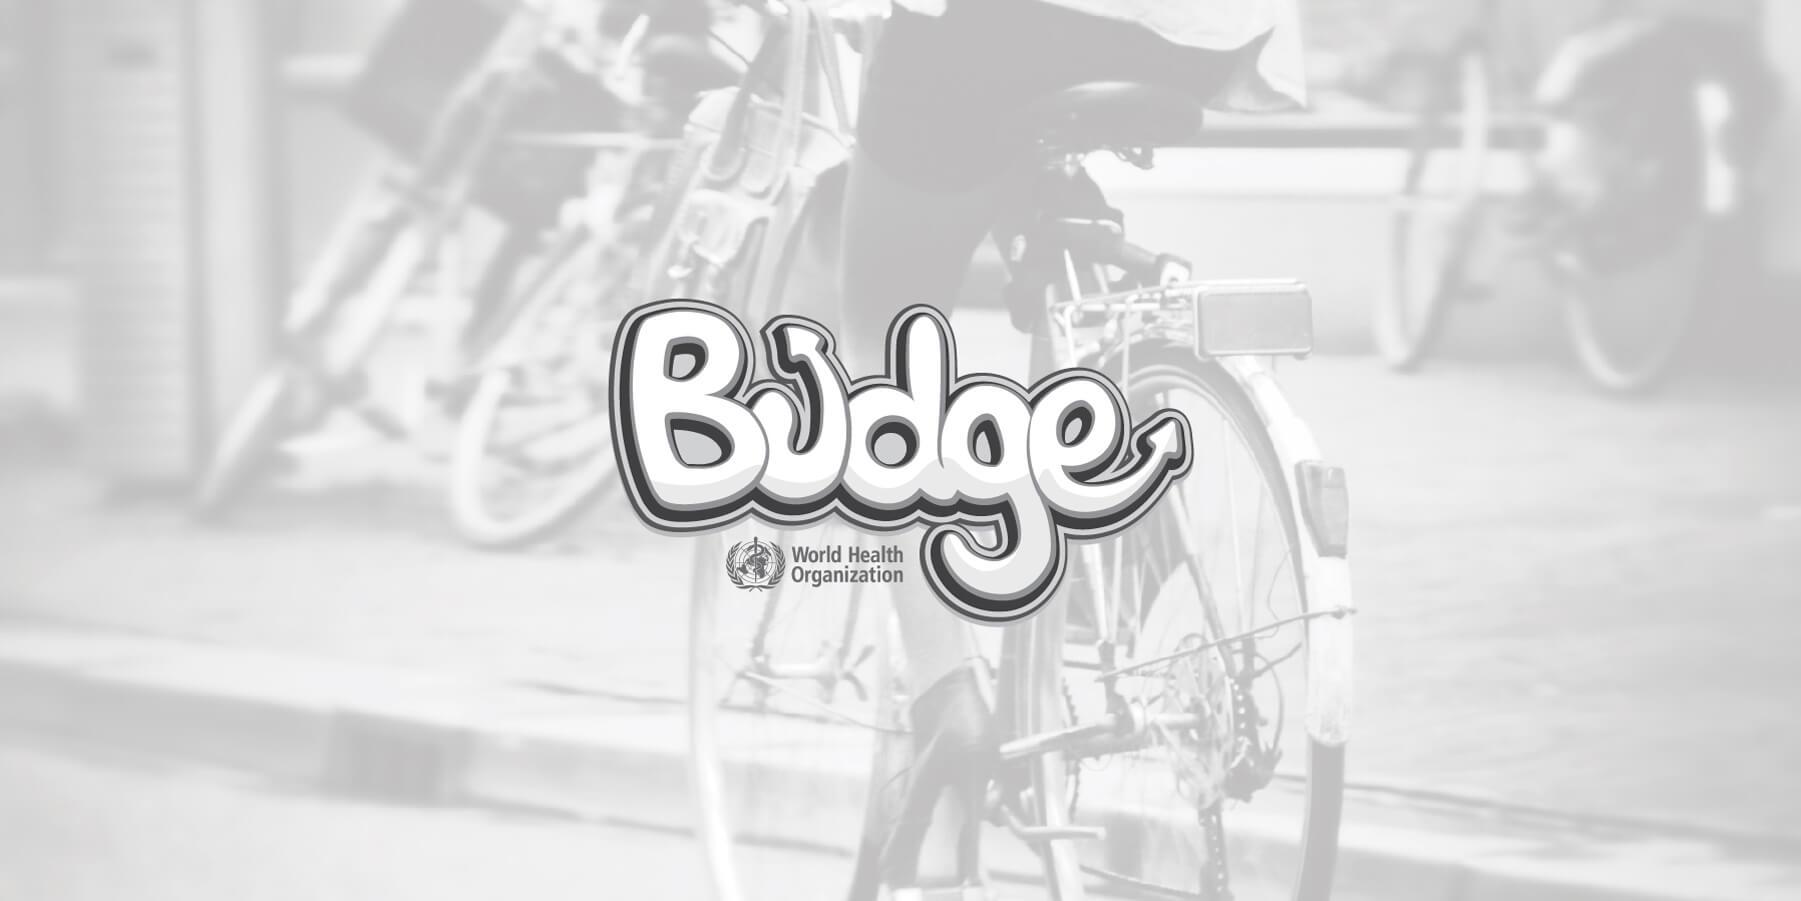 BUDGEBeBg